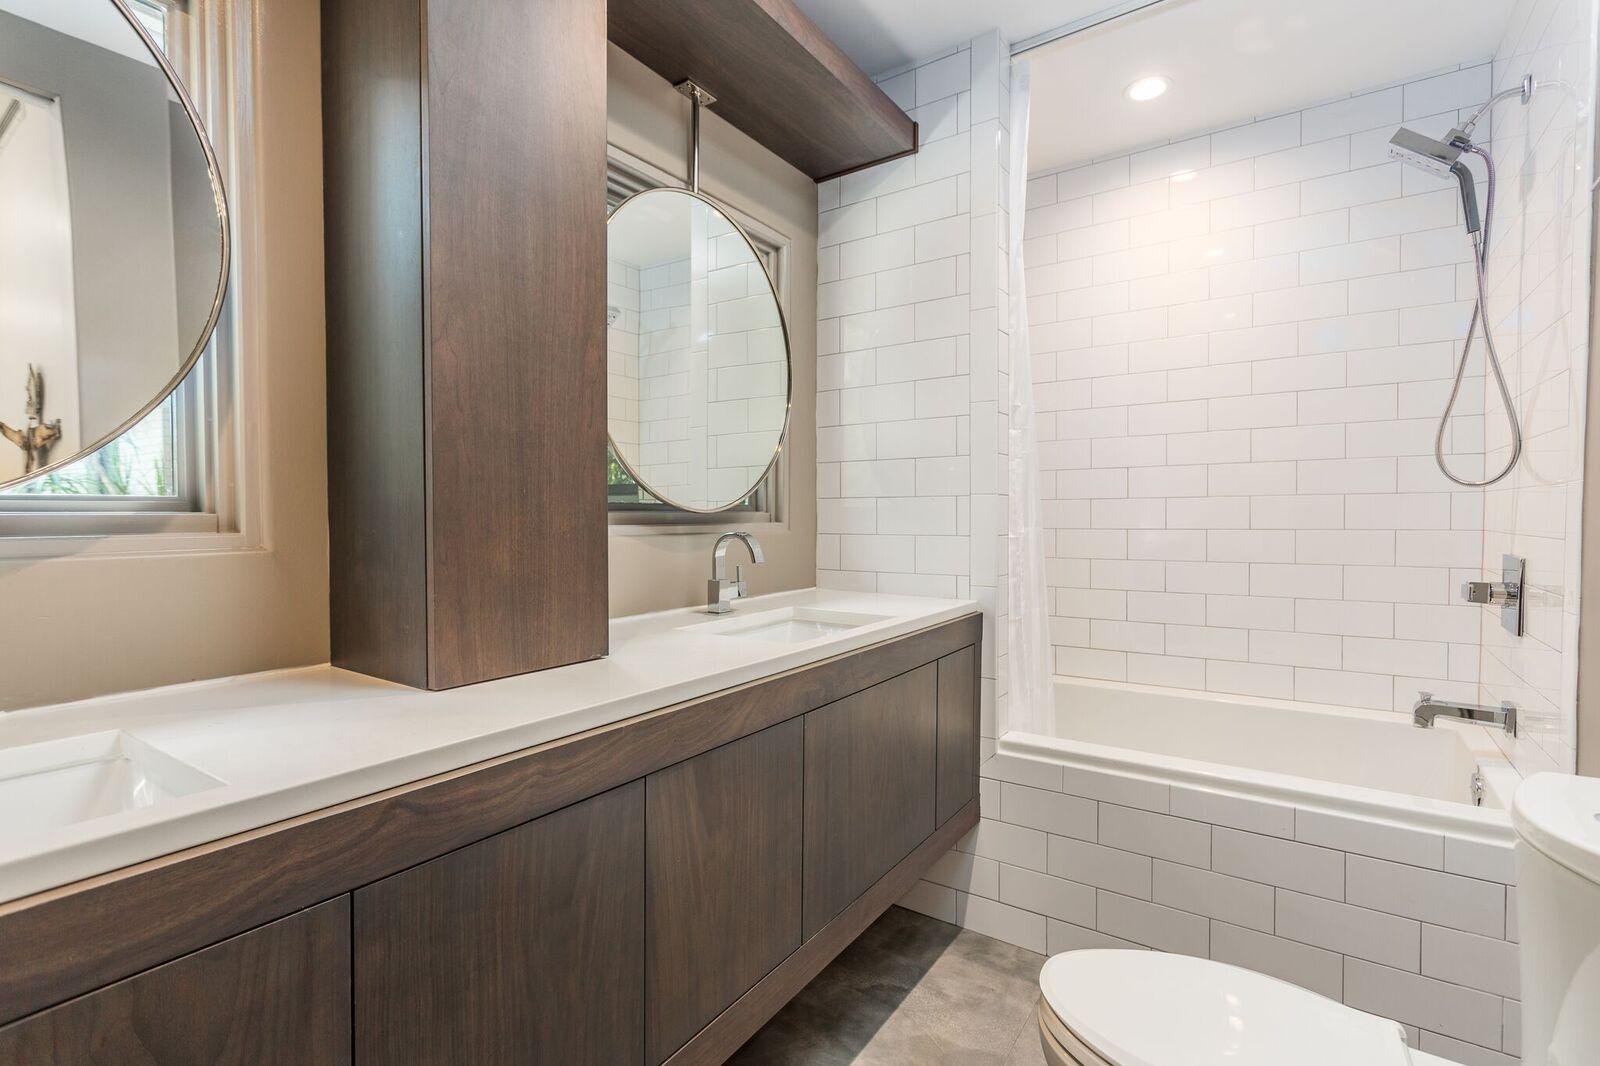 Custom Cabinets with Custom Mirror Brackets